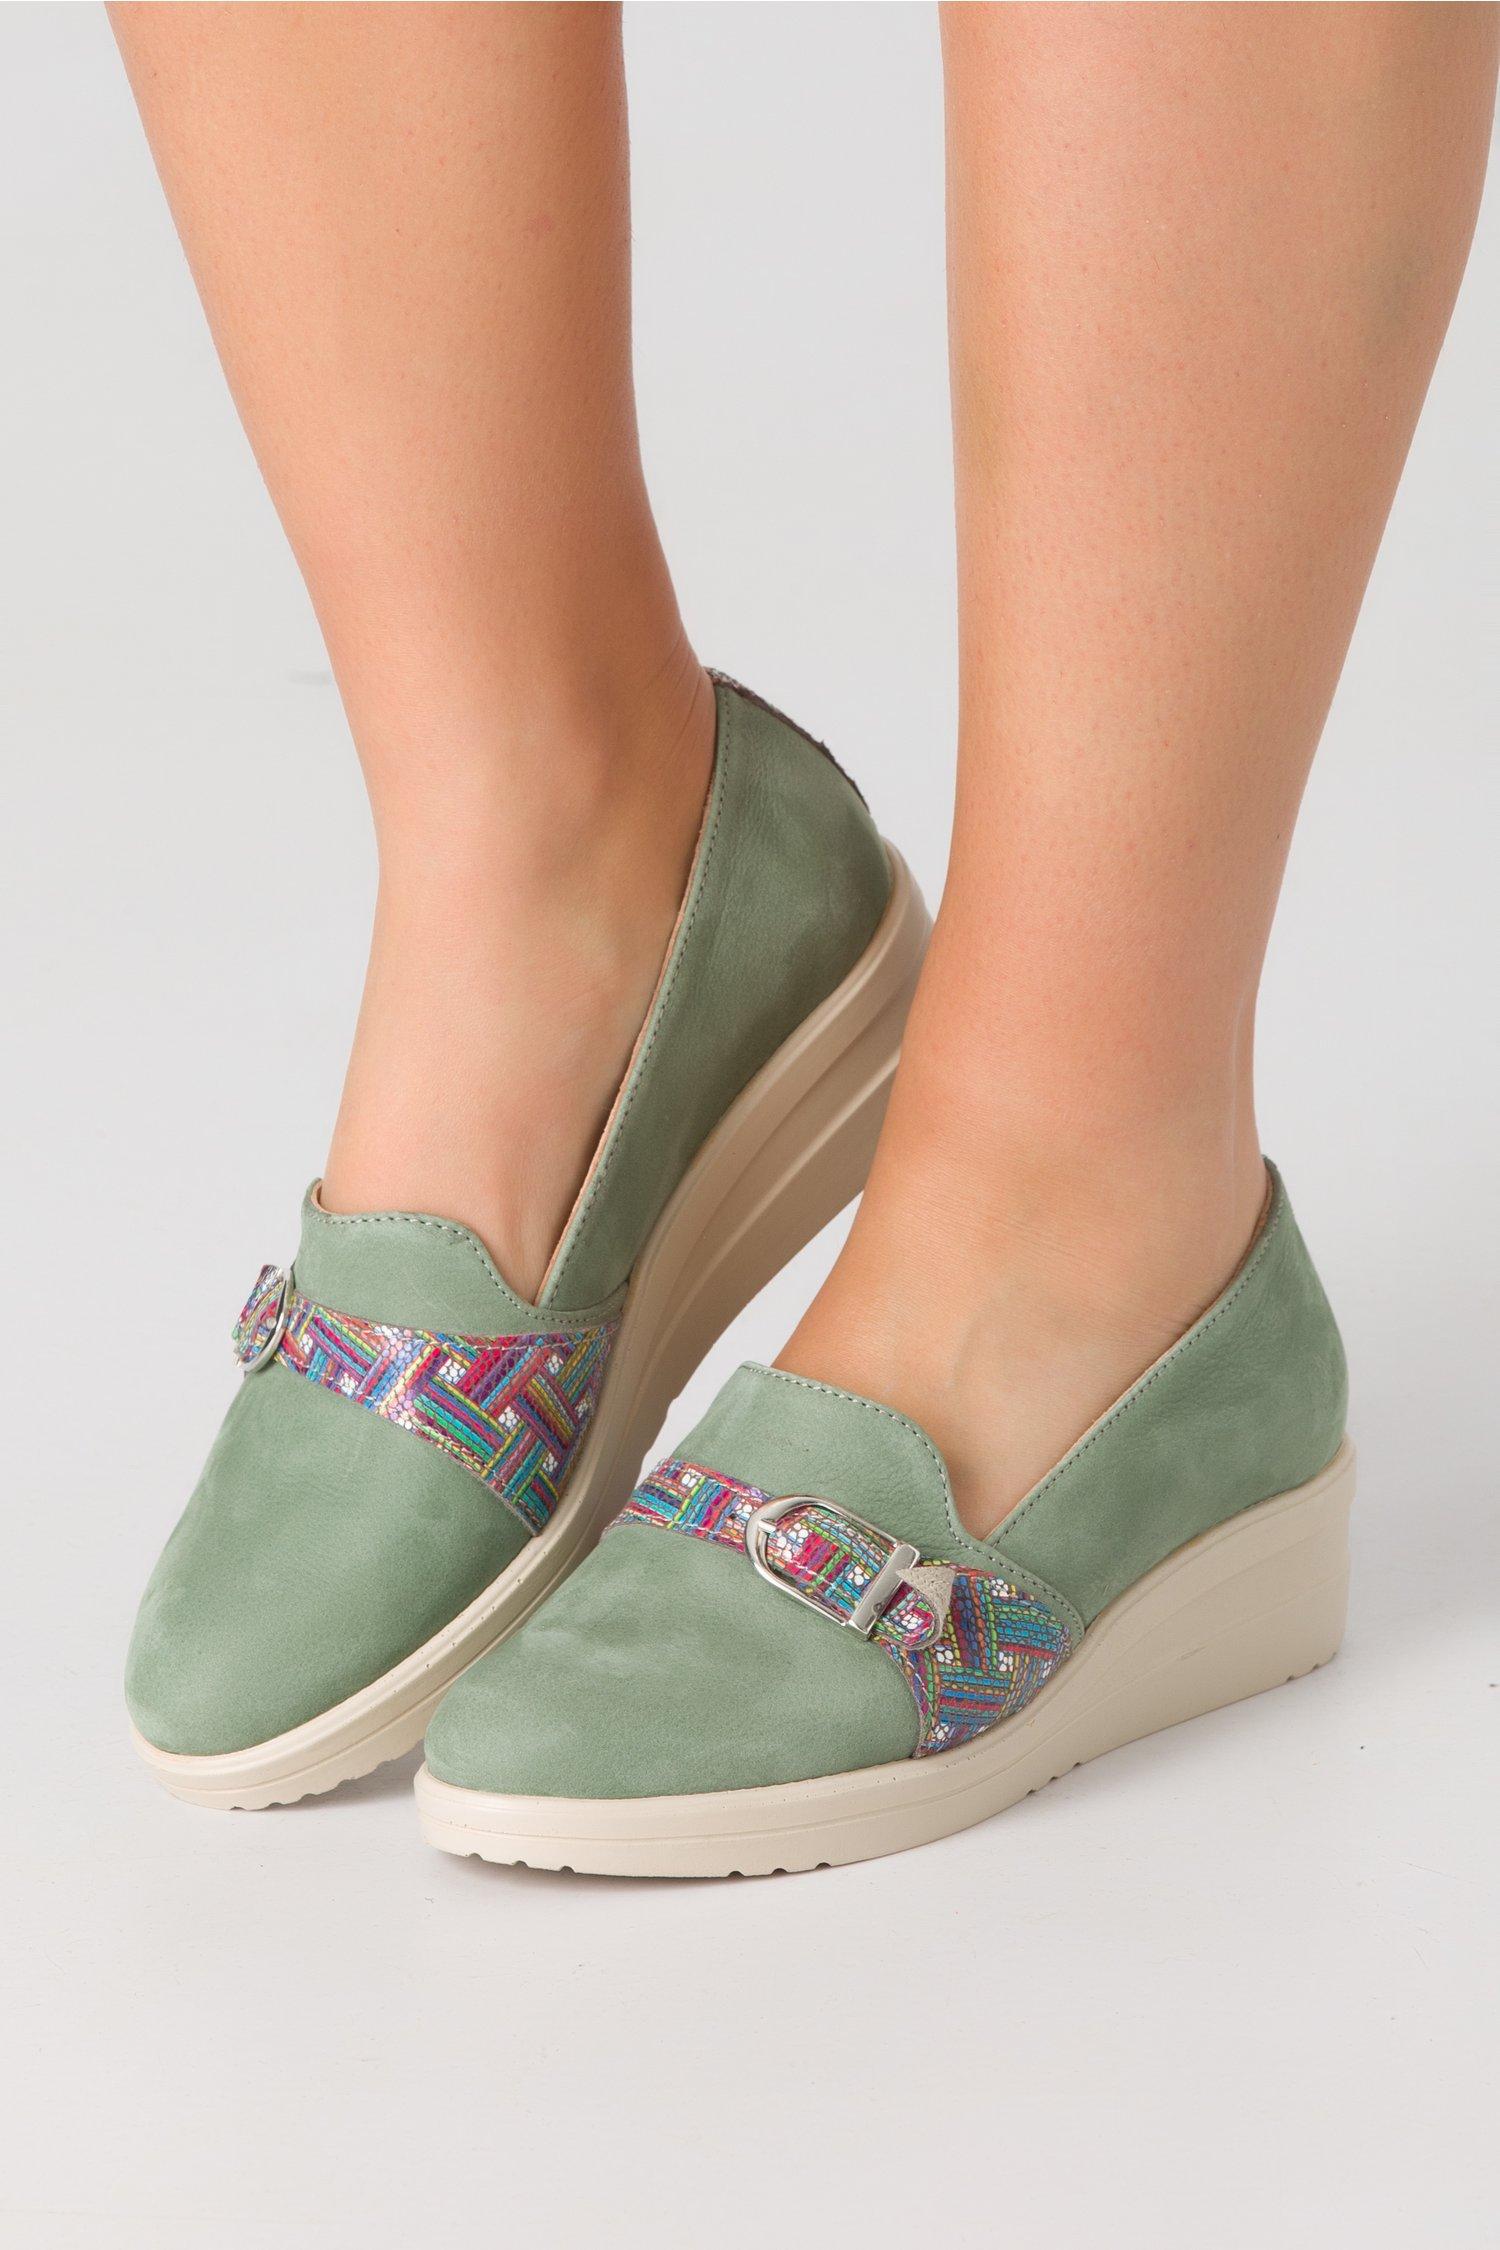 Pantofi Emma kaki cu detaliu metalic si imprimeu in partea din fata